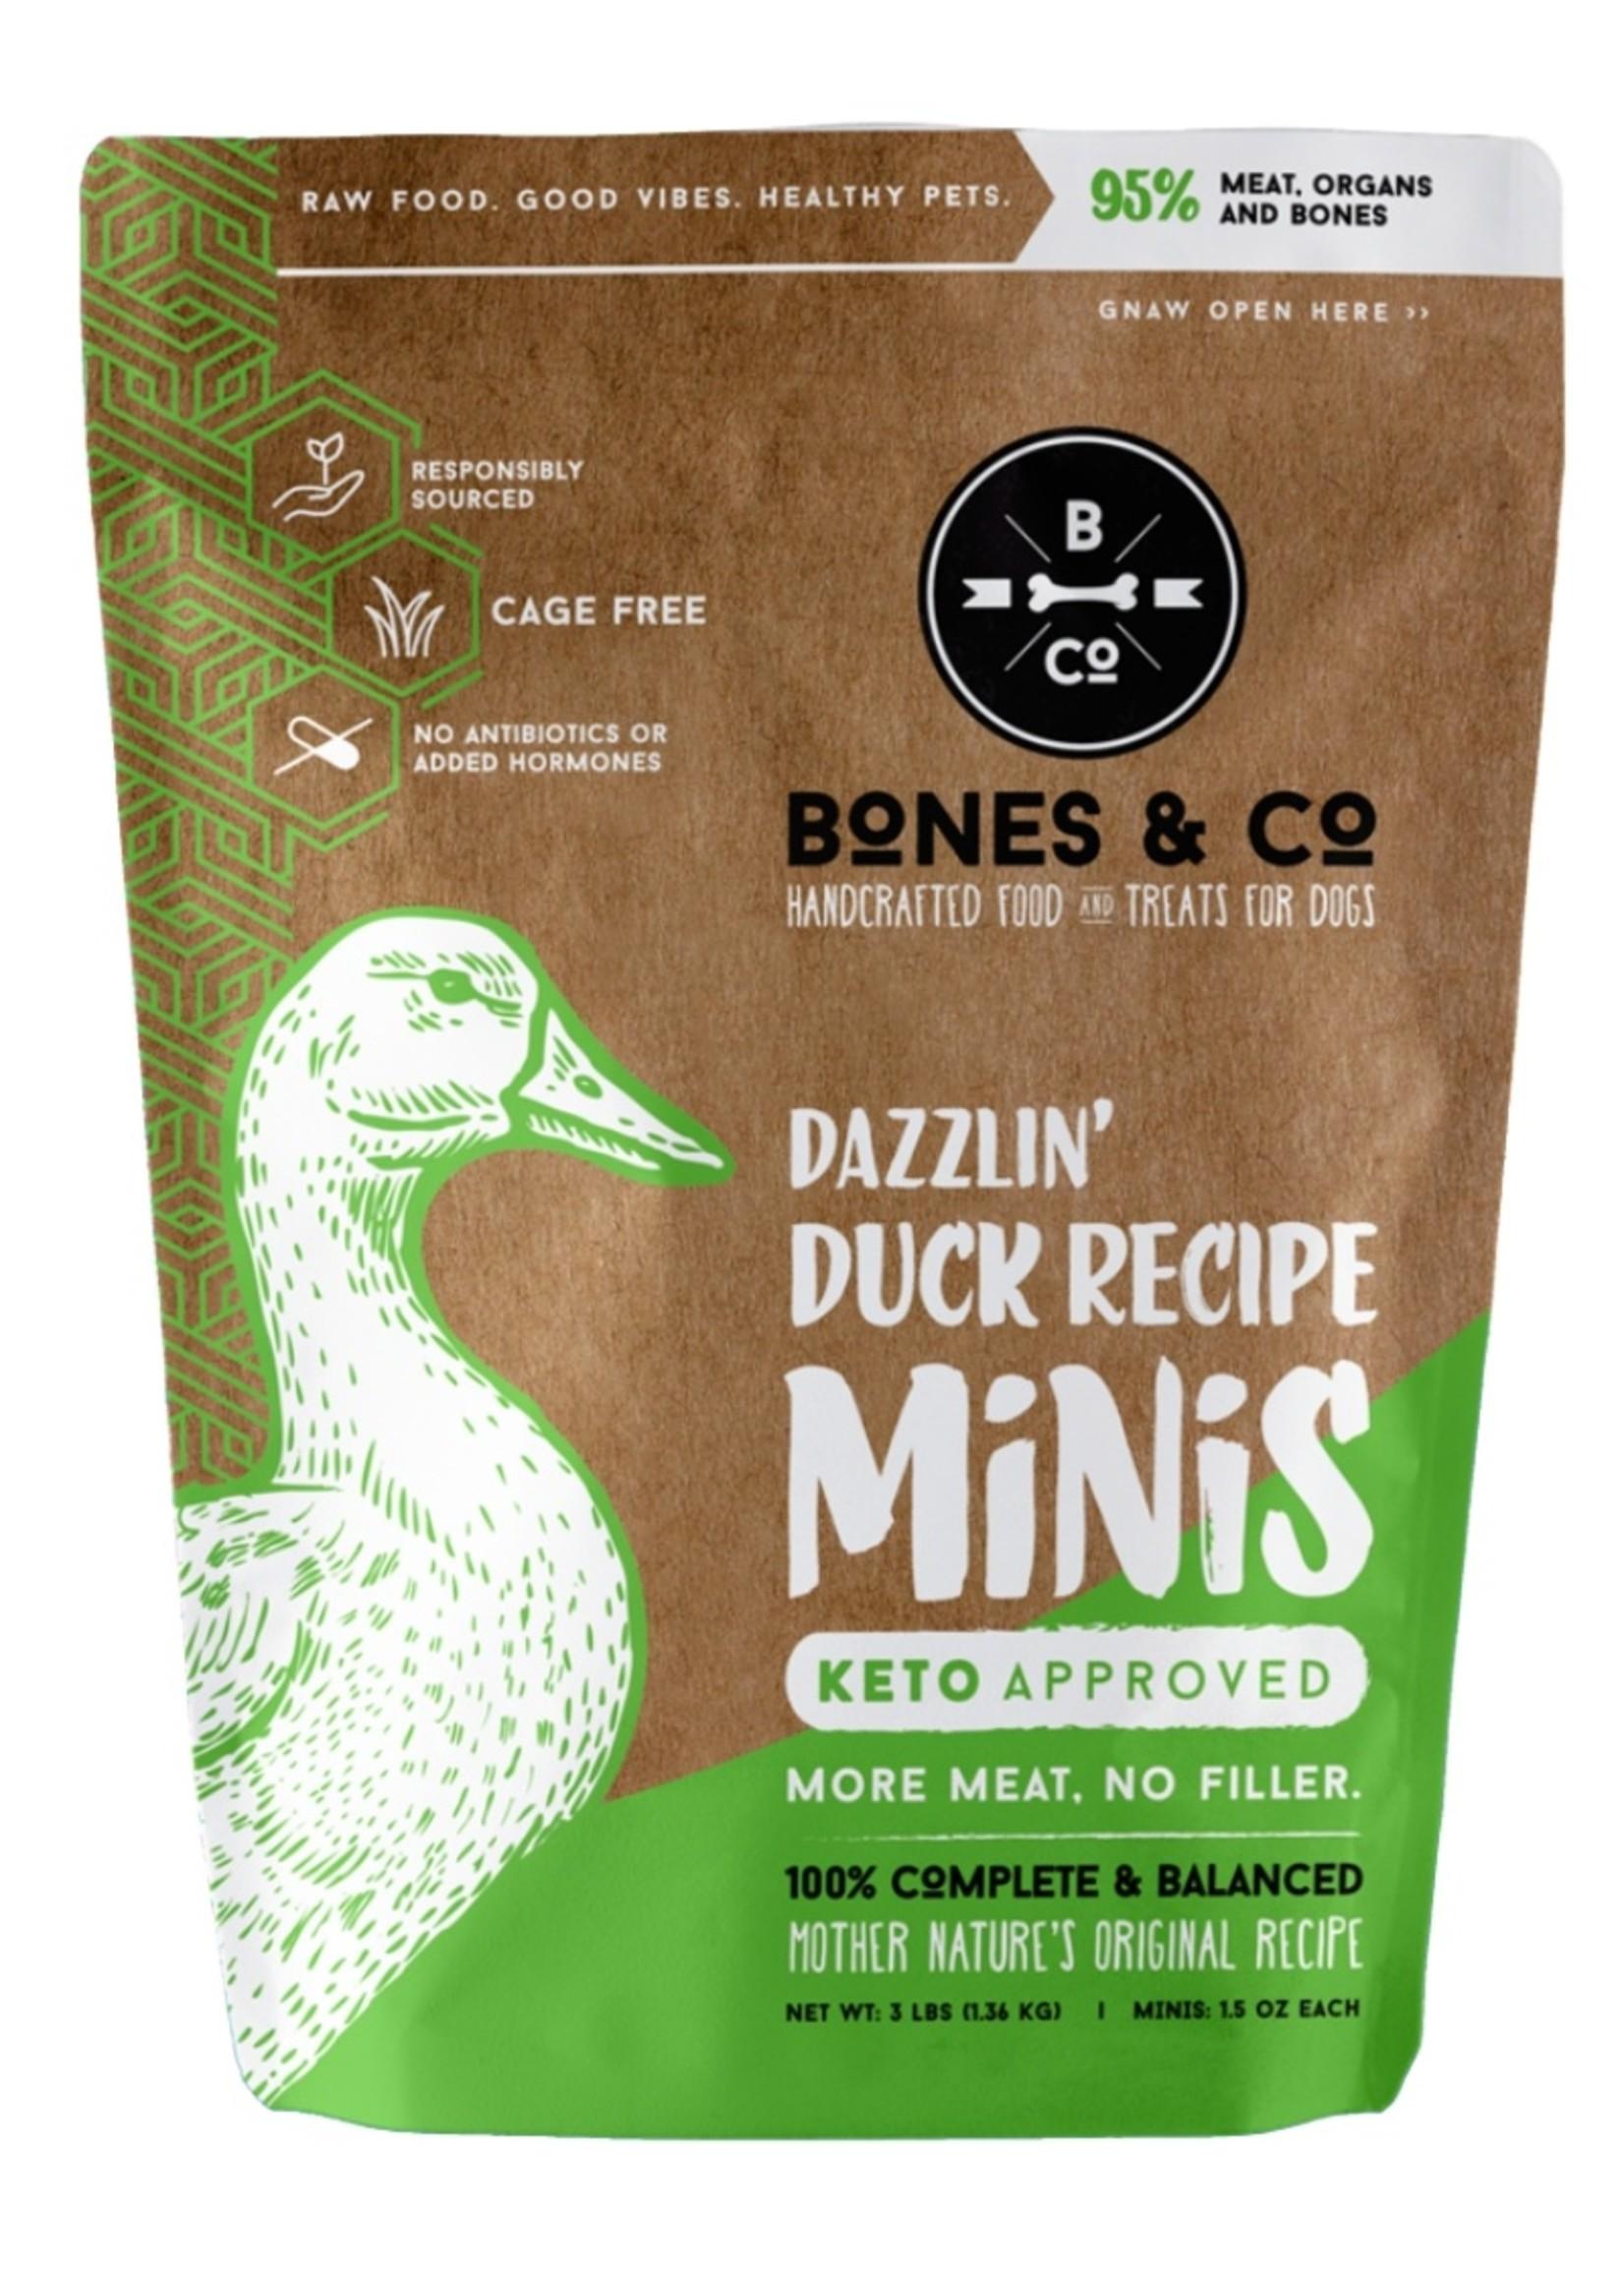 BONES & CO Bones & Co Dazzlin' Duck Recipe